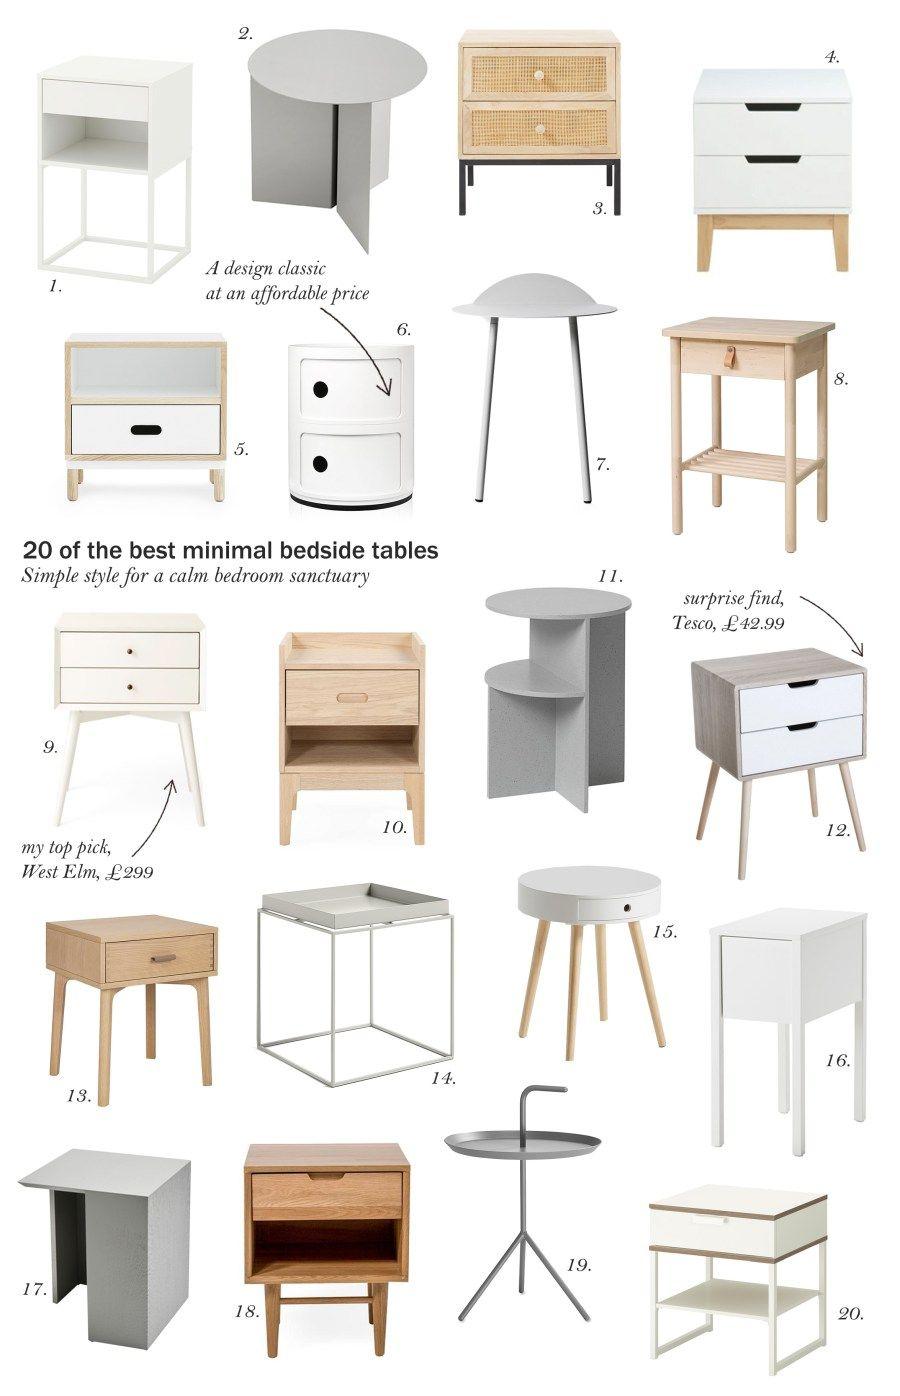 20 Of The Best Minimal Scandi Style Bedside Tables Bedside Table Decor Home Decor Side Tables Bedroom